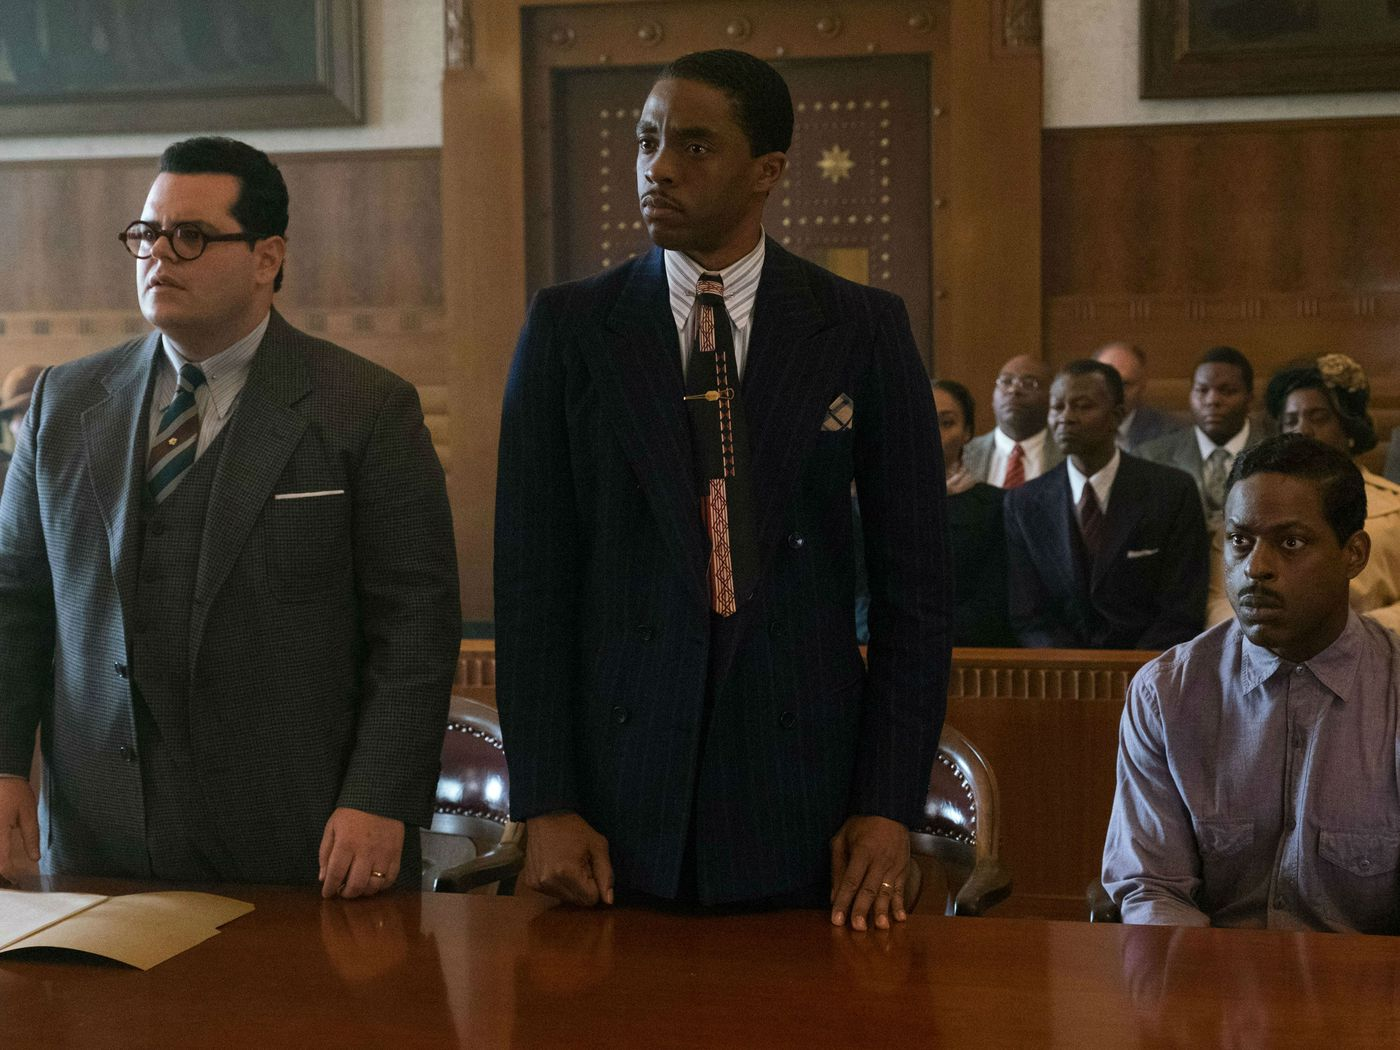 SCOTUS Justice Thurgood Marshall